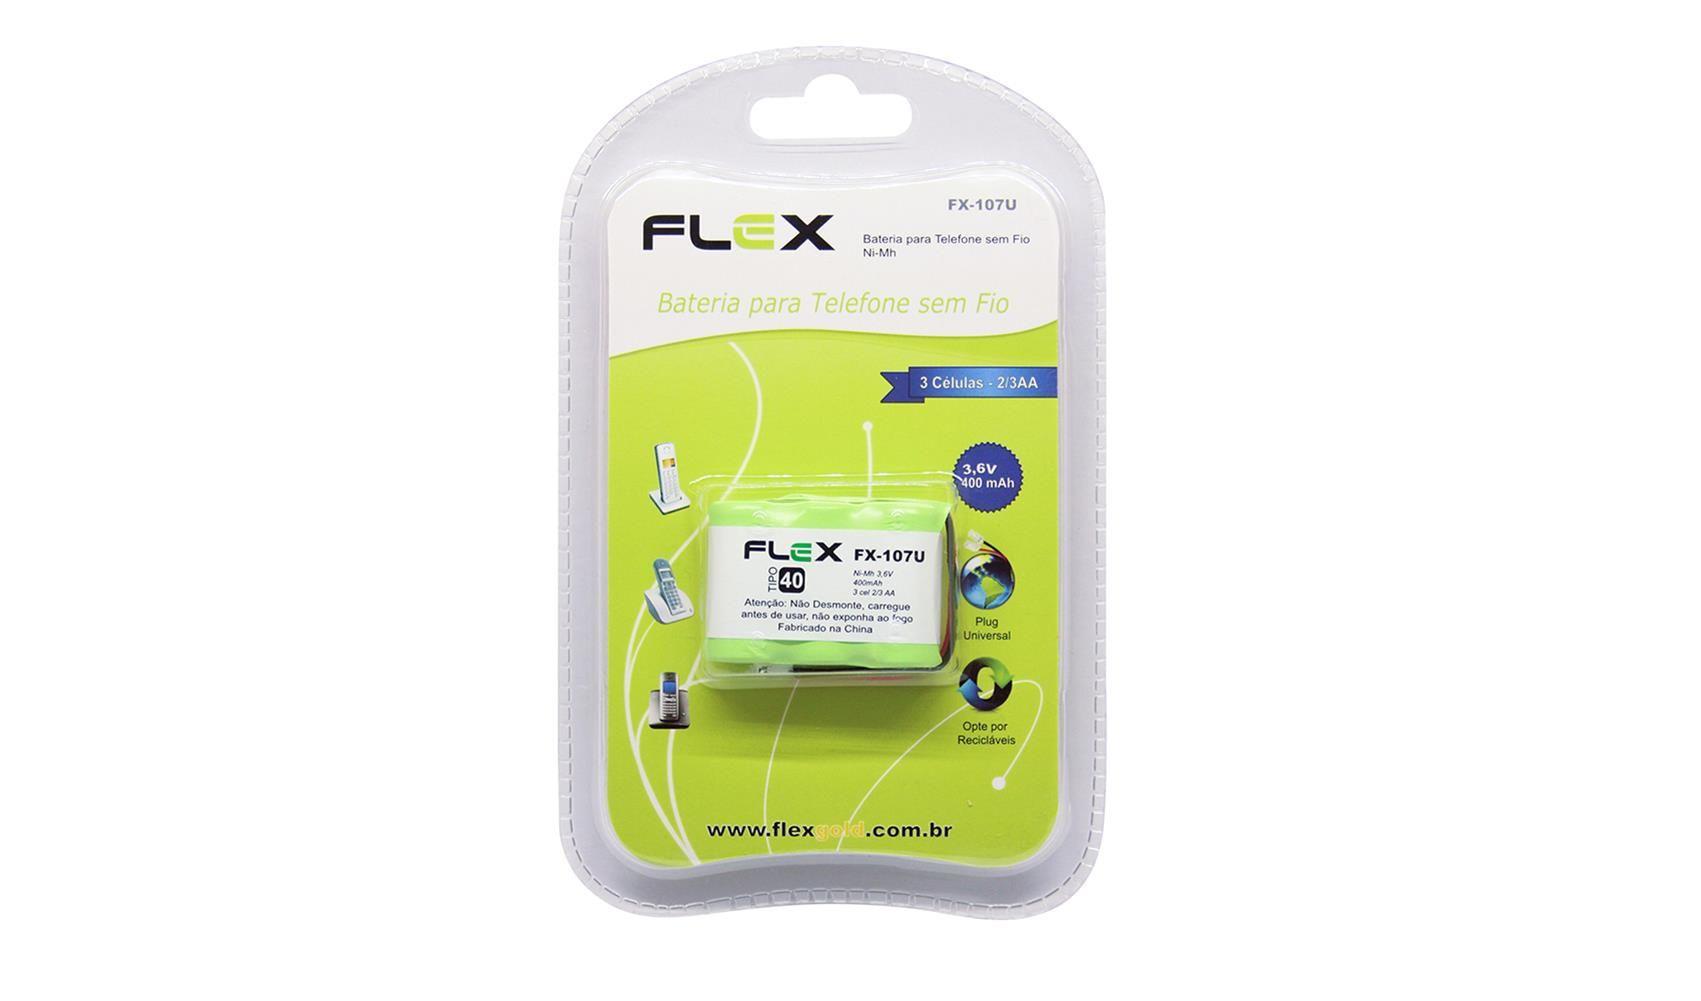 Bateria Telefone Sem Fio Ni-cd 3.6v 400mah Fx-107u Flex